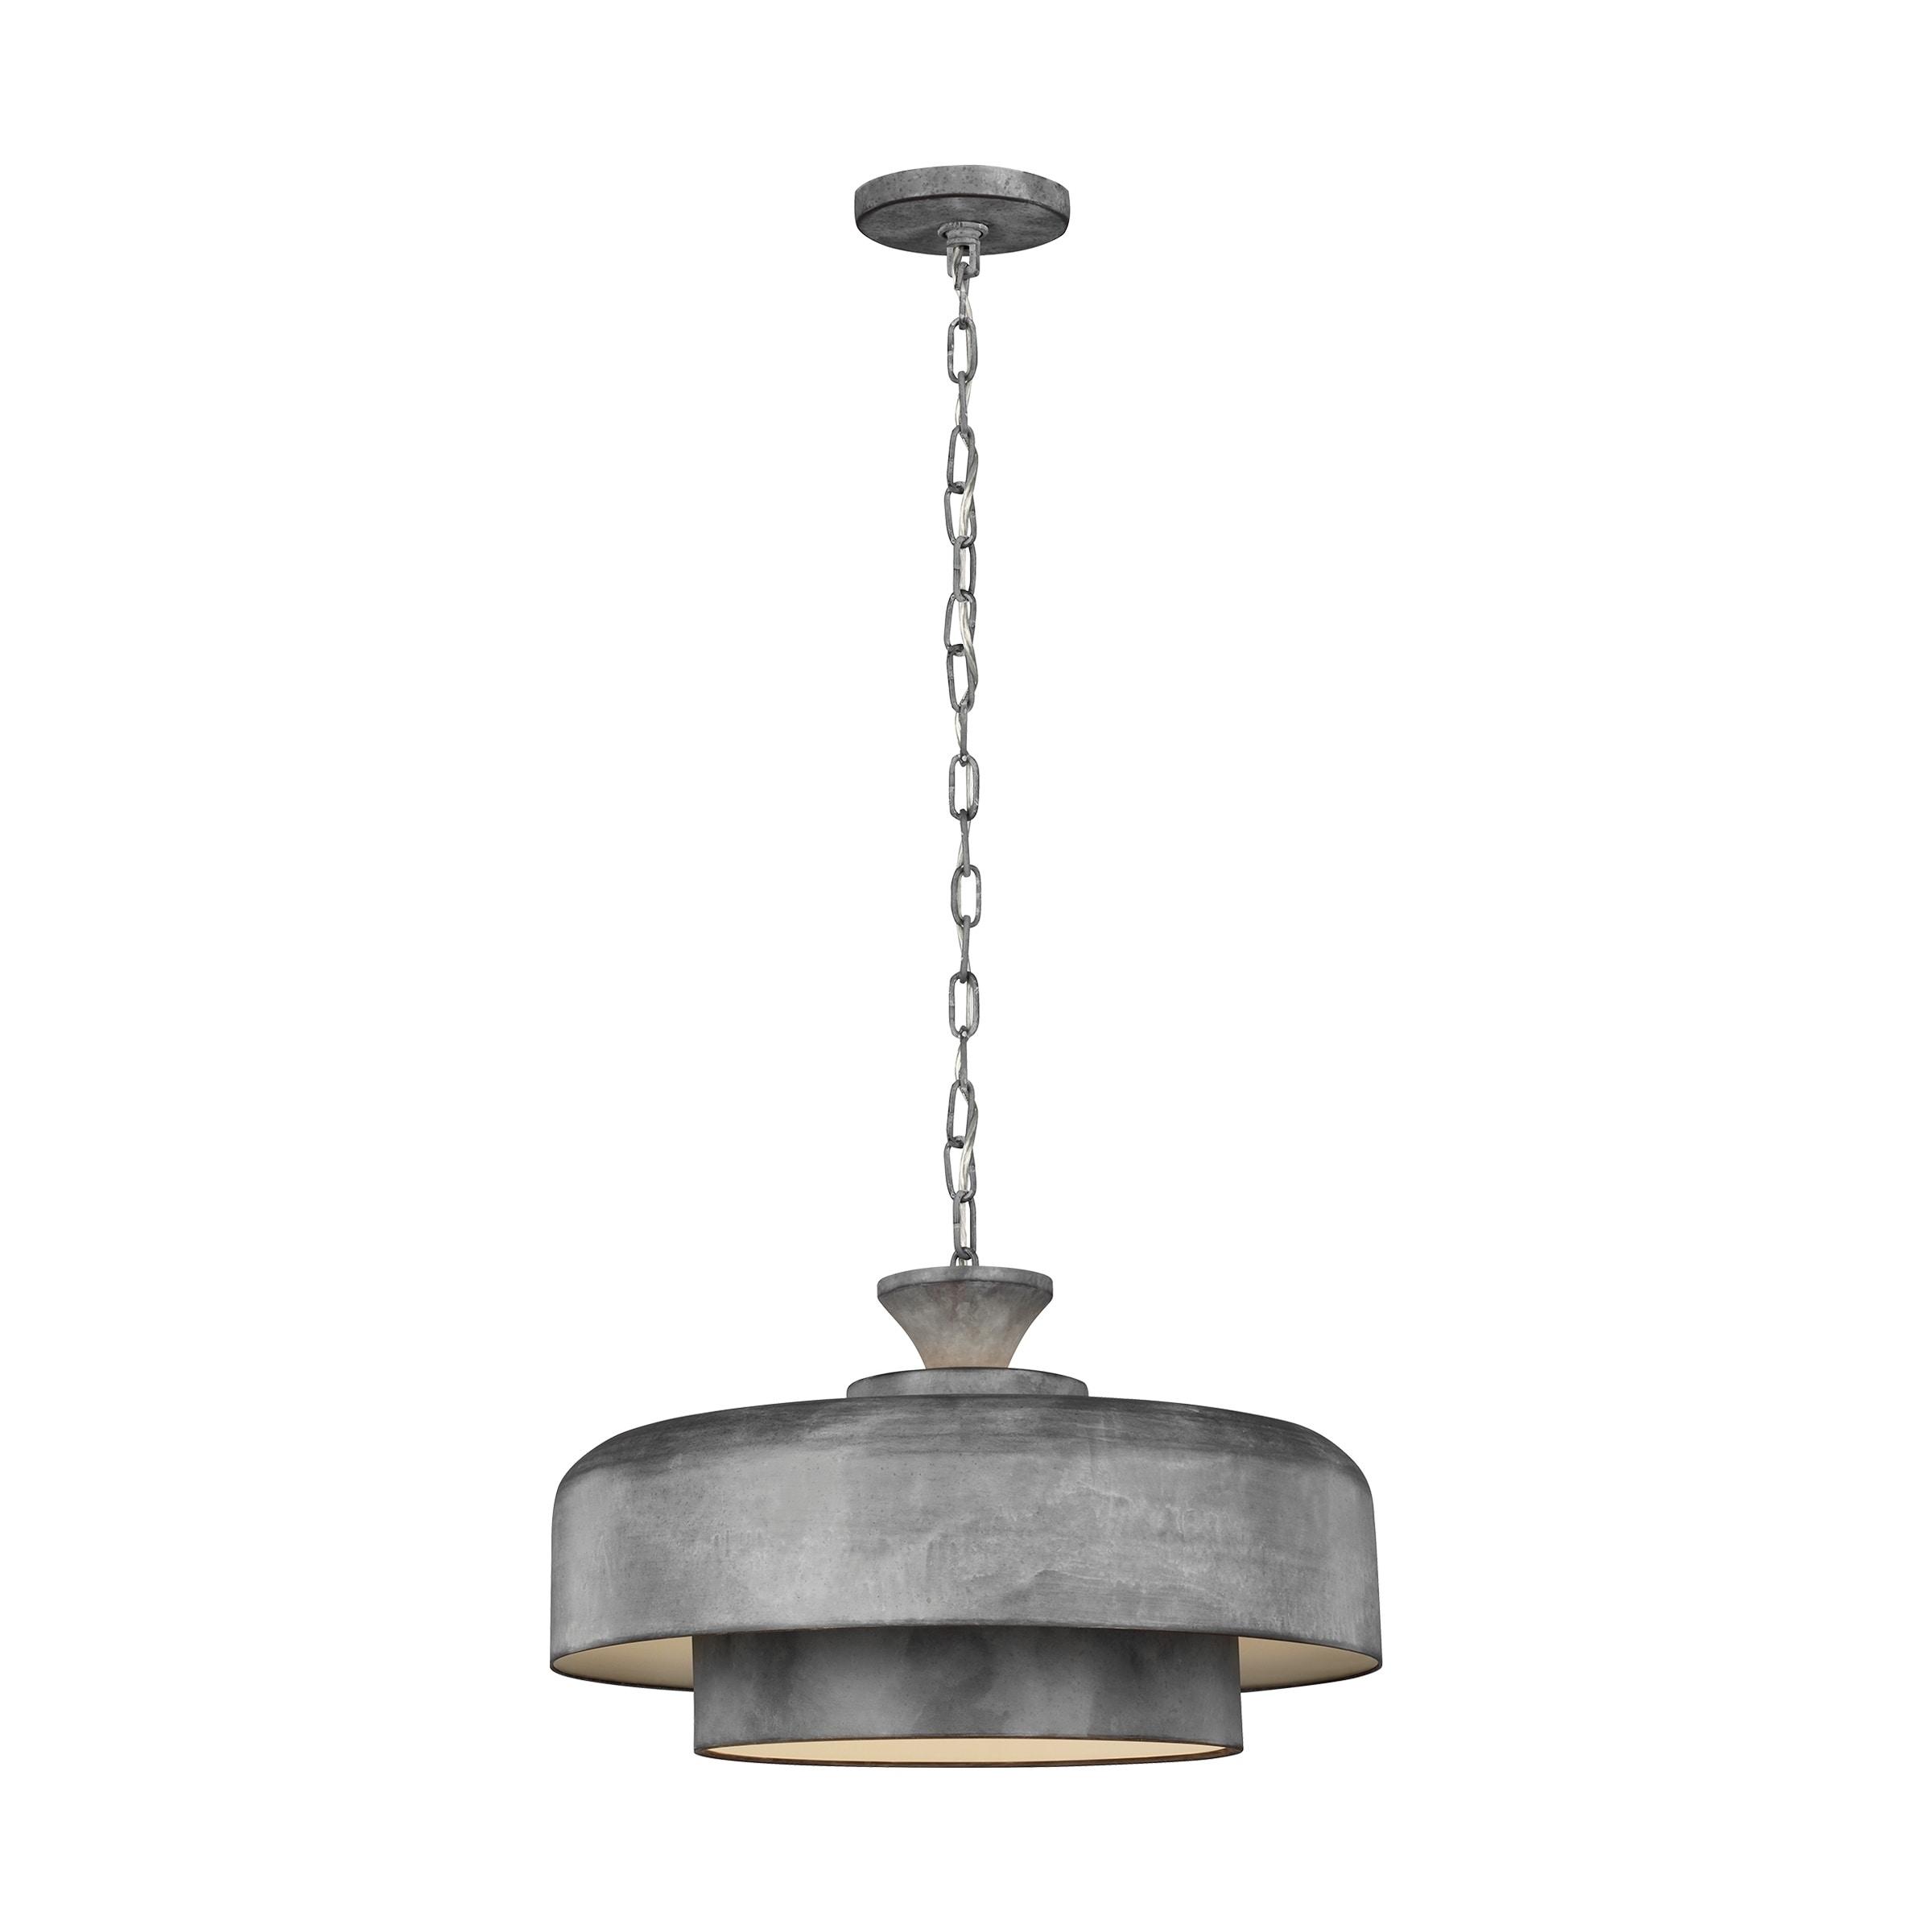 Shop Haymarket Weathered Galvanized Steel 1 Light Pendant Overstock 27190330